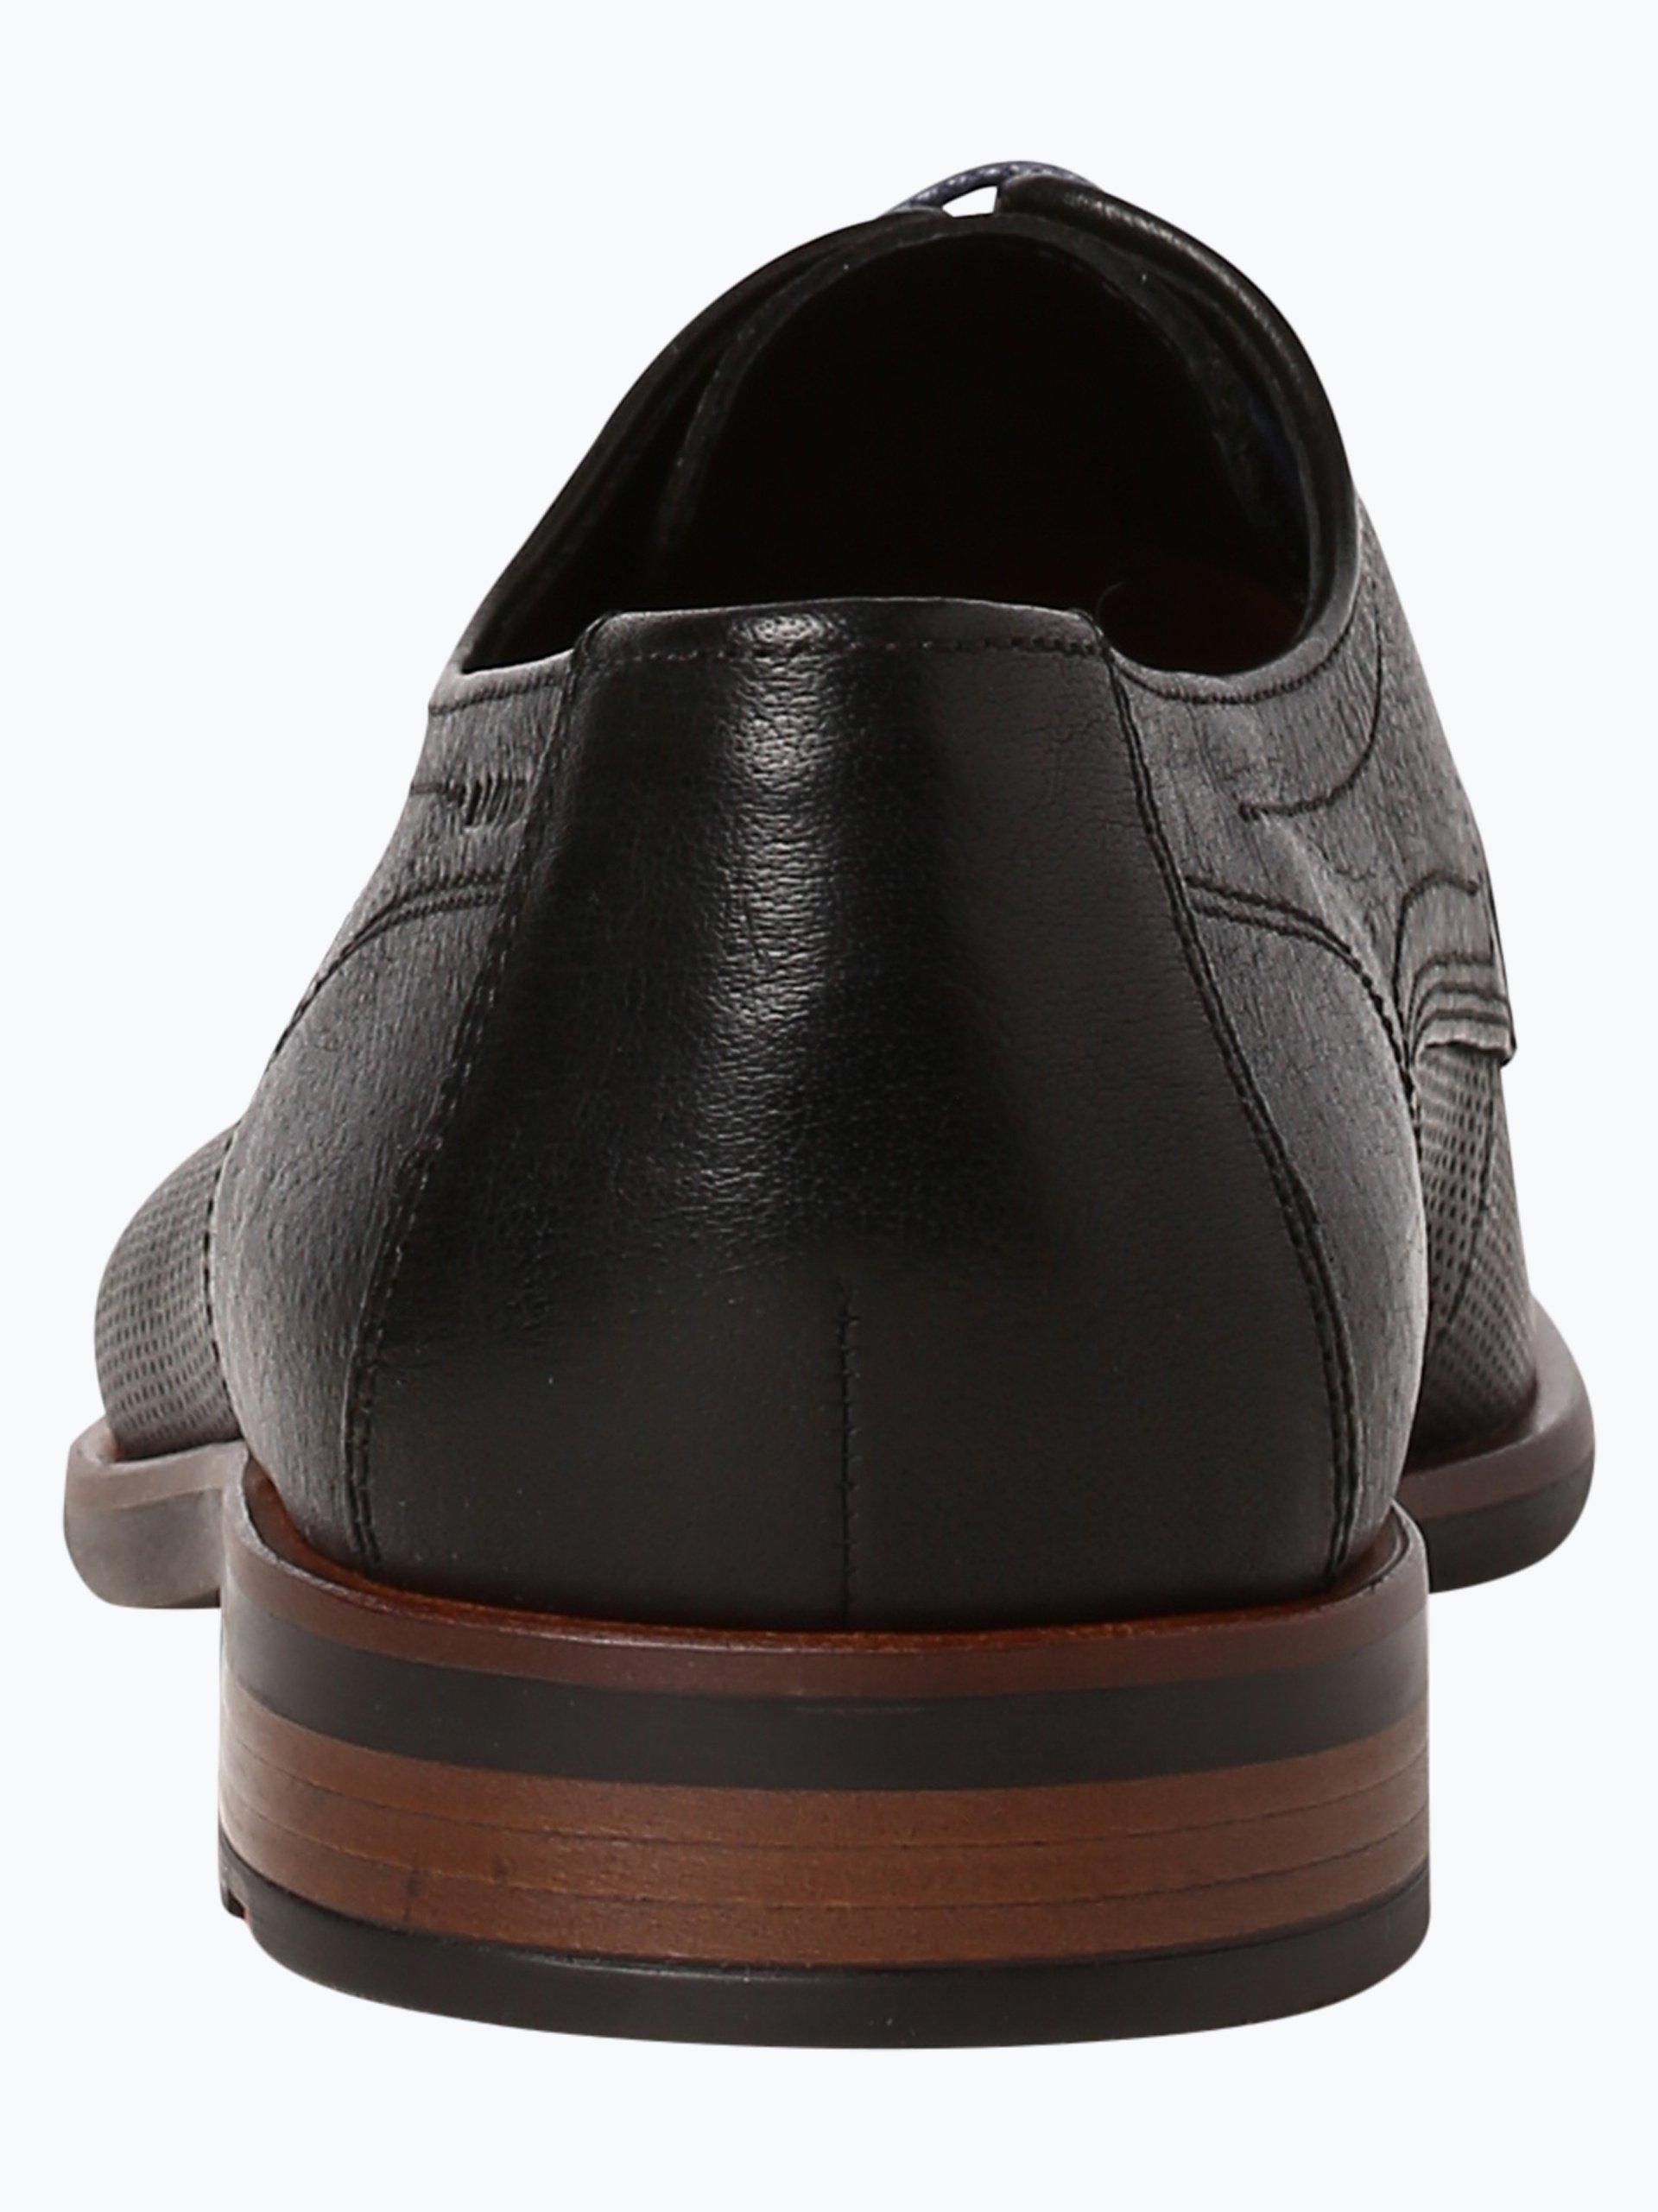 Lloyd Herren Schnürschuhe aus Leder - Drayton